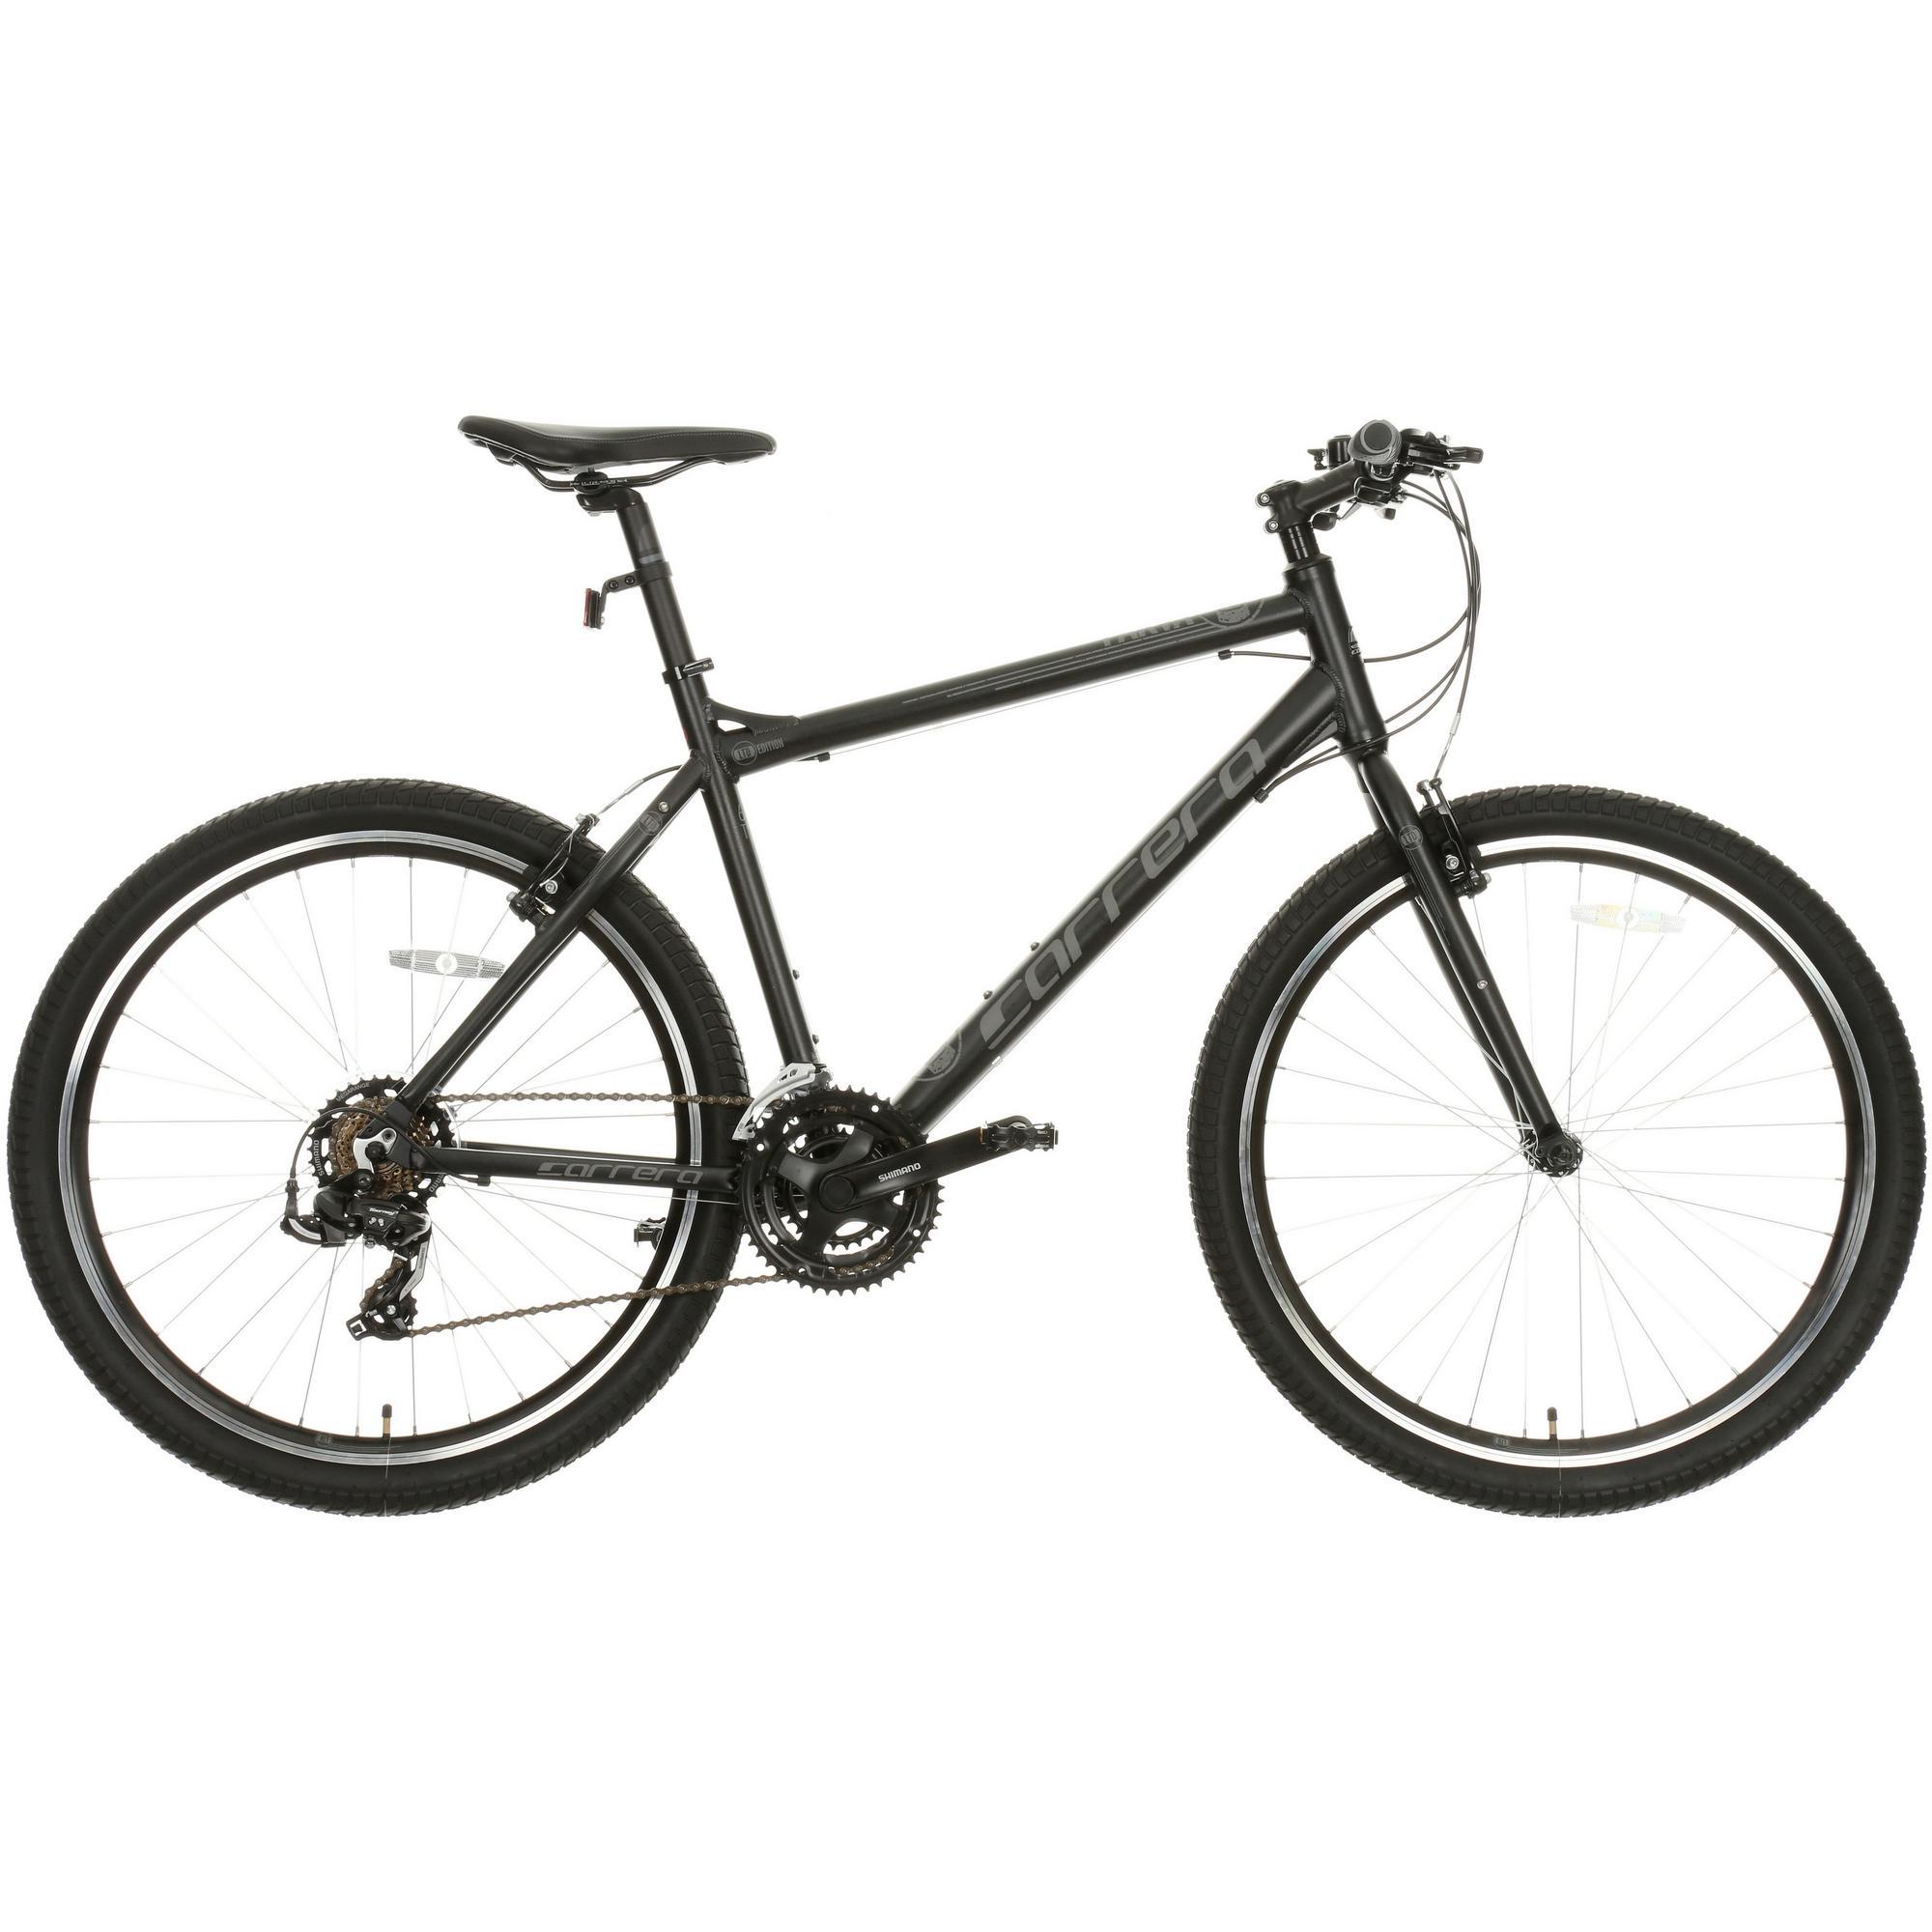 Carrera Parva Mens/womens Hybrid Bike - Black, £189 at Halfords-w/c